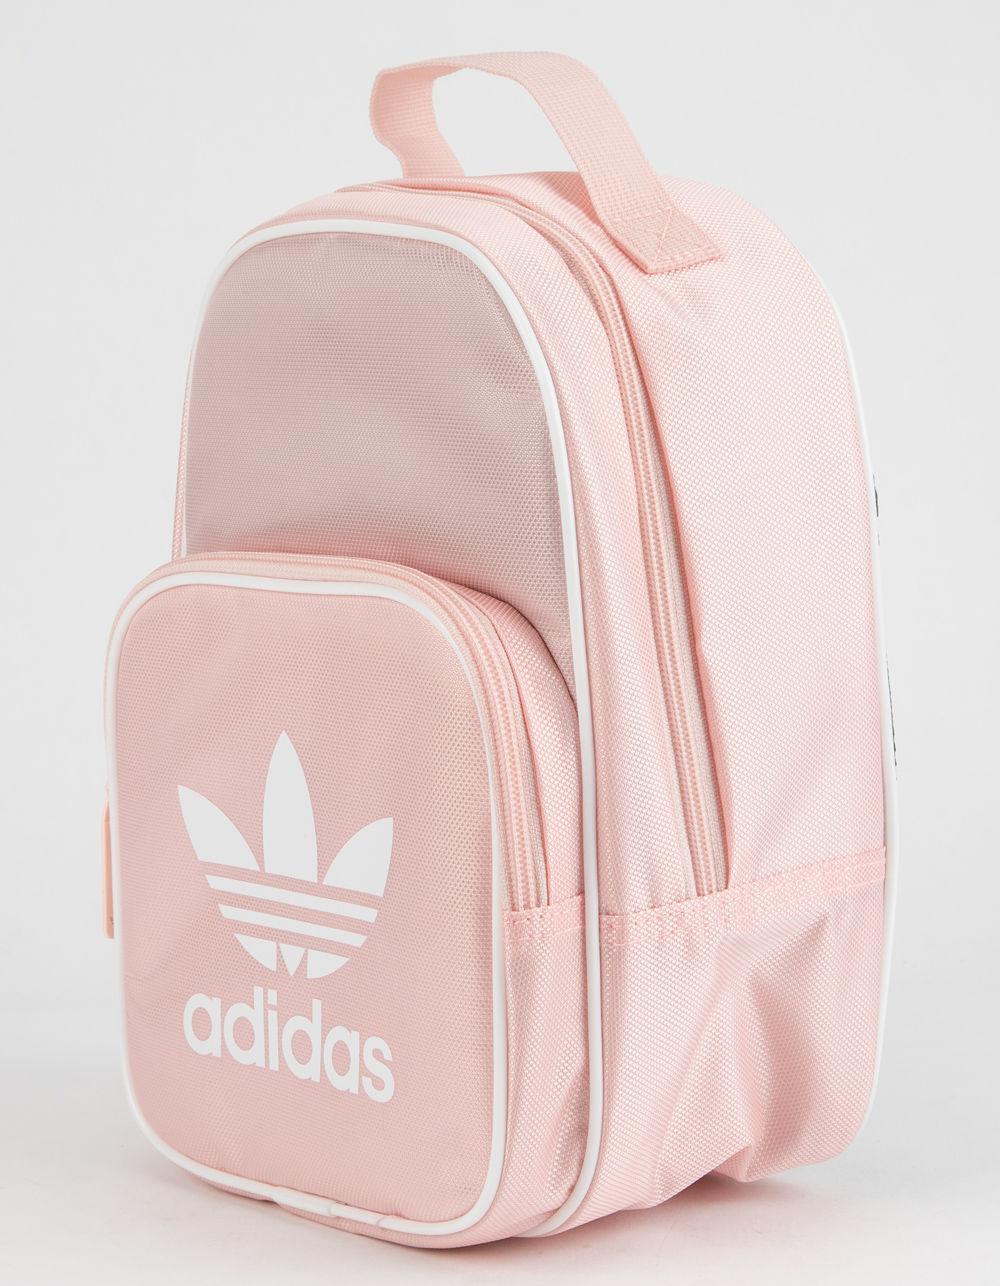 Lyst - adidas Originals Santiago Pink Lunch Bag in Pink 27f87f7829